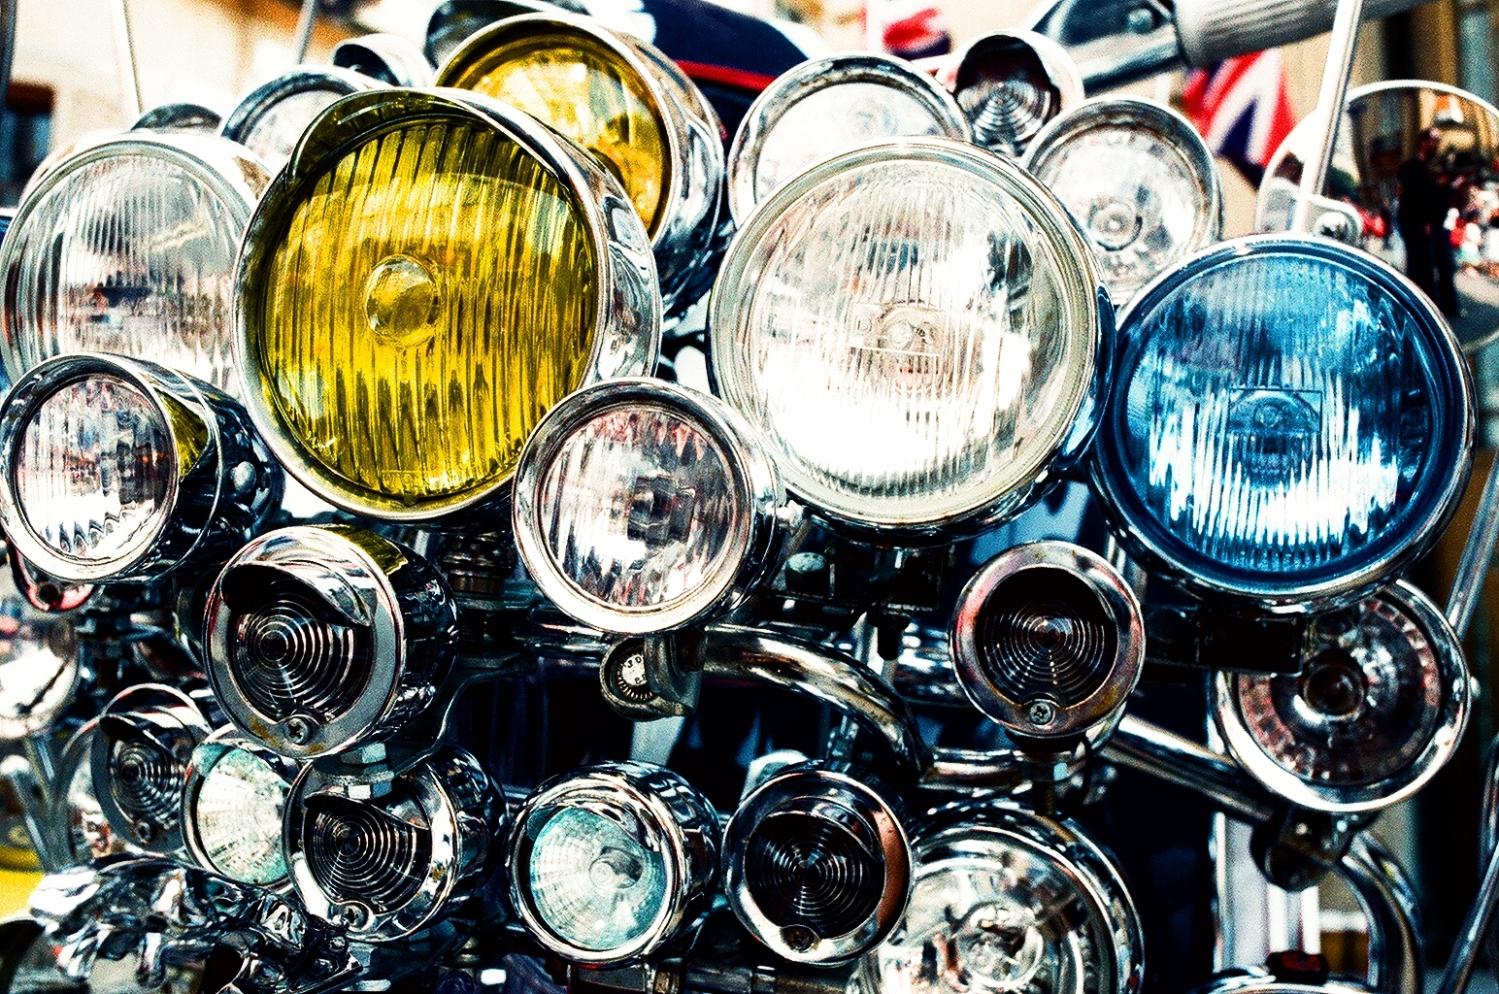 Scooter_headlights